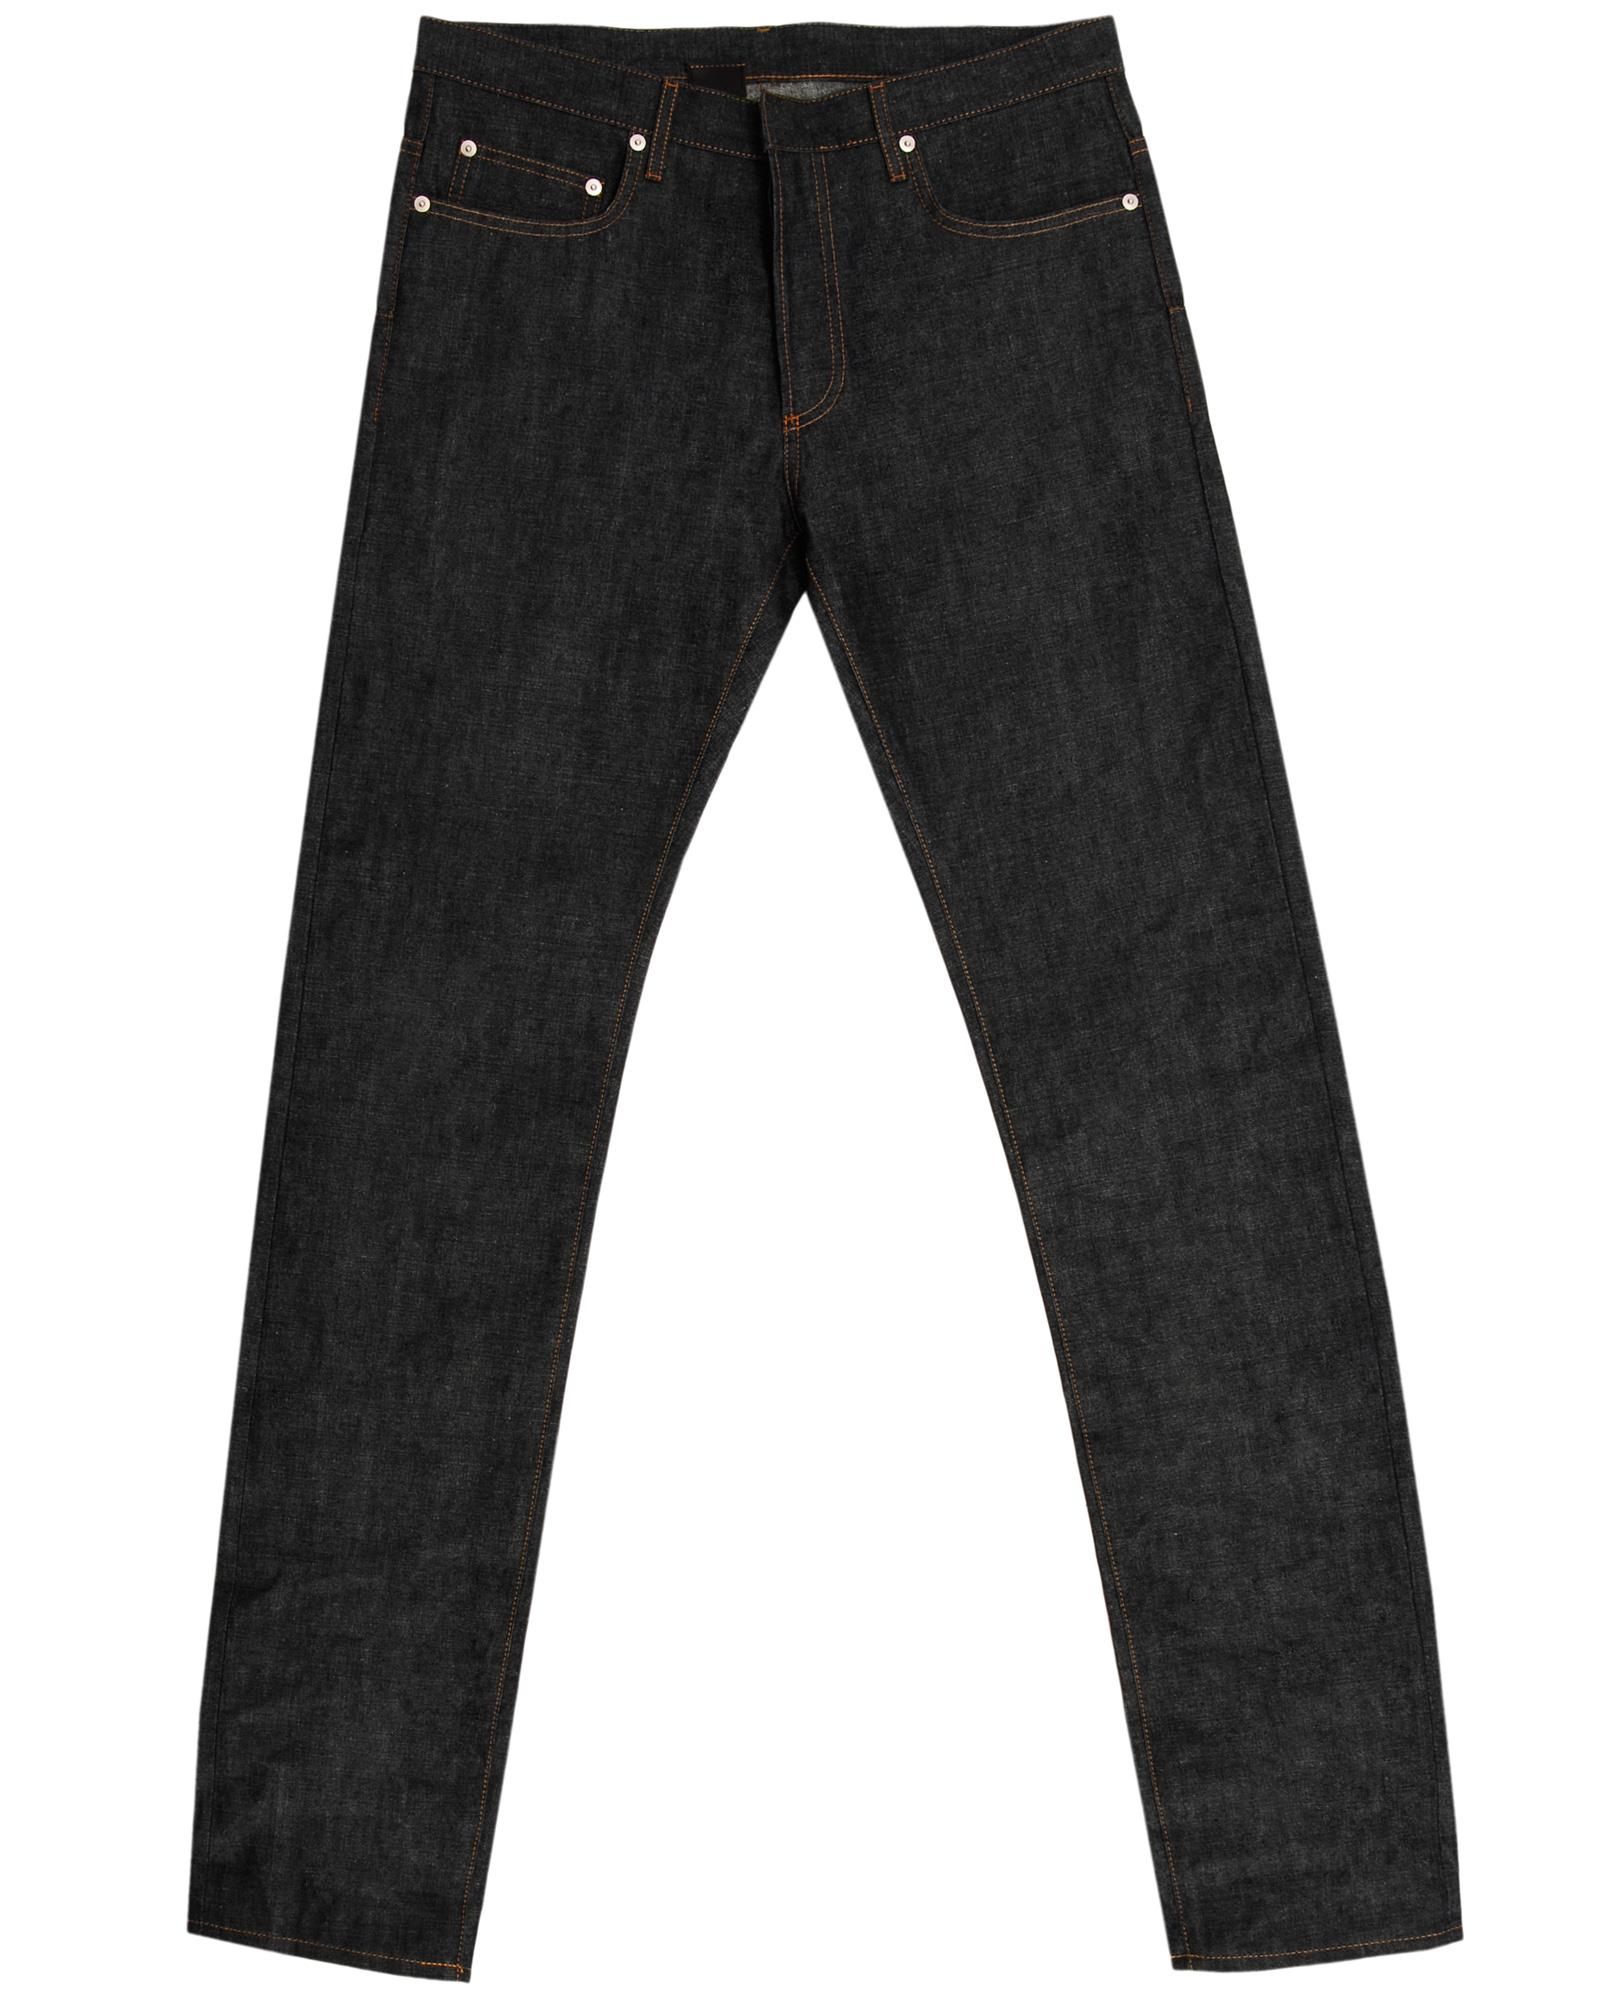 dior homme 19 inch japanese selvage jeans in blue for men. Black Bedroom Furniture Sets. Home Design Ideas